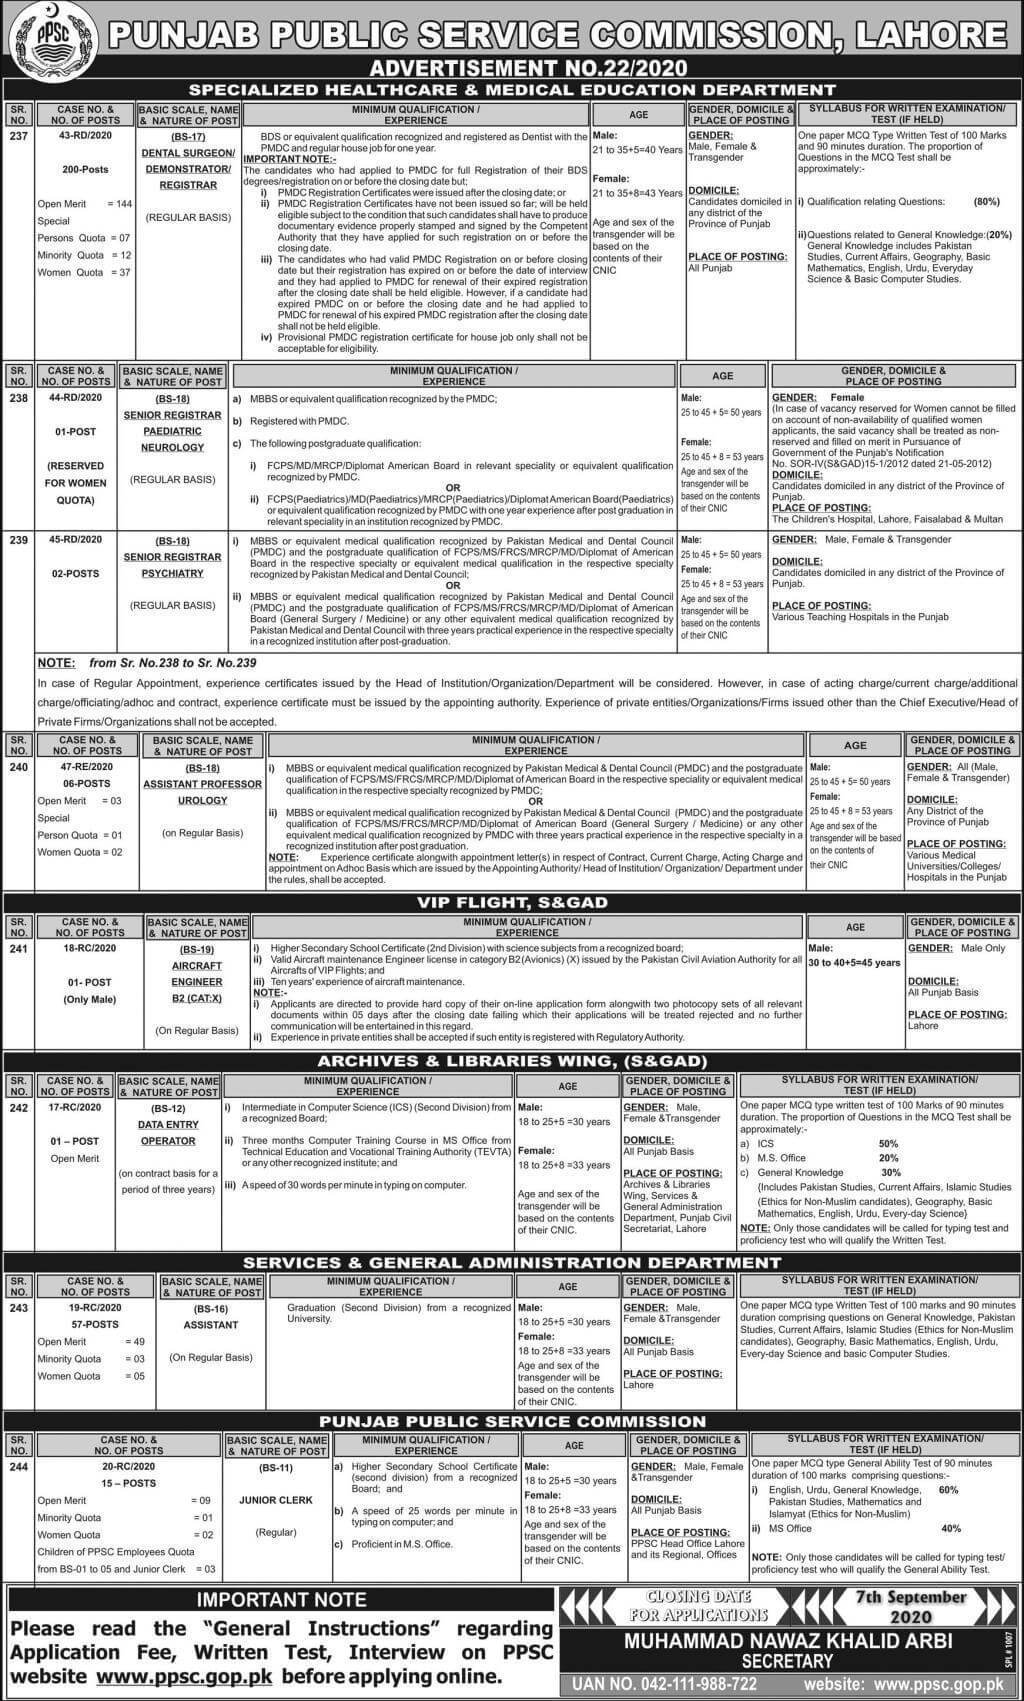 PPSC Jobs 2020 | Advertisement No 22/2020